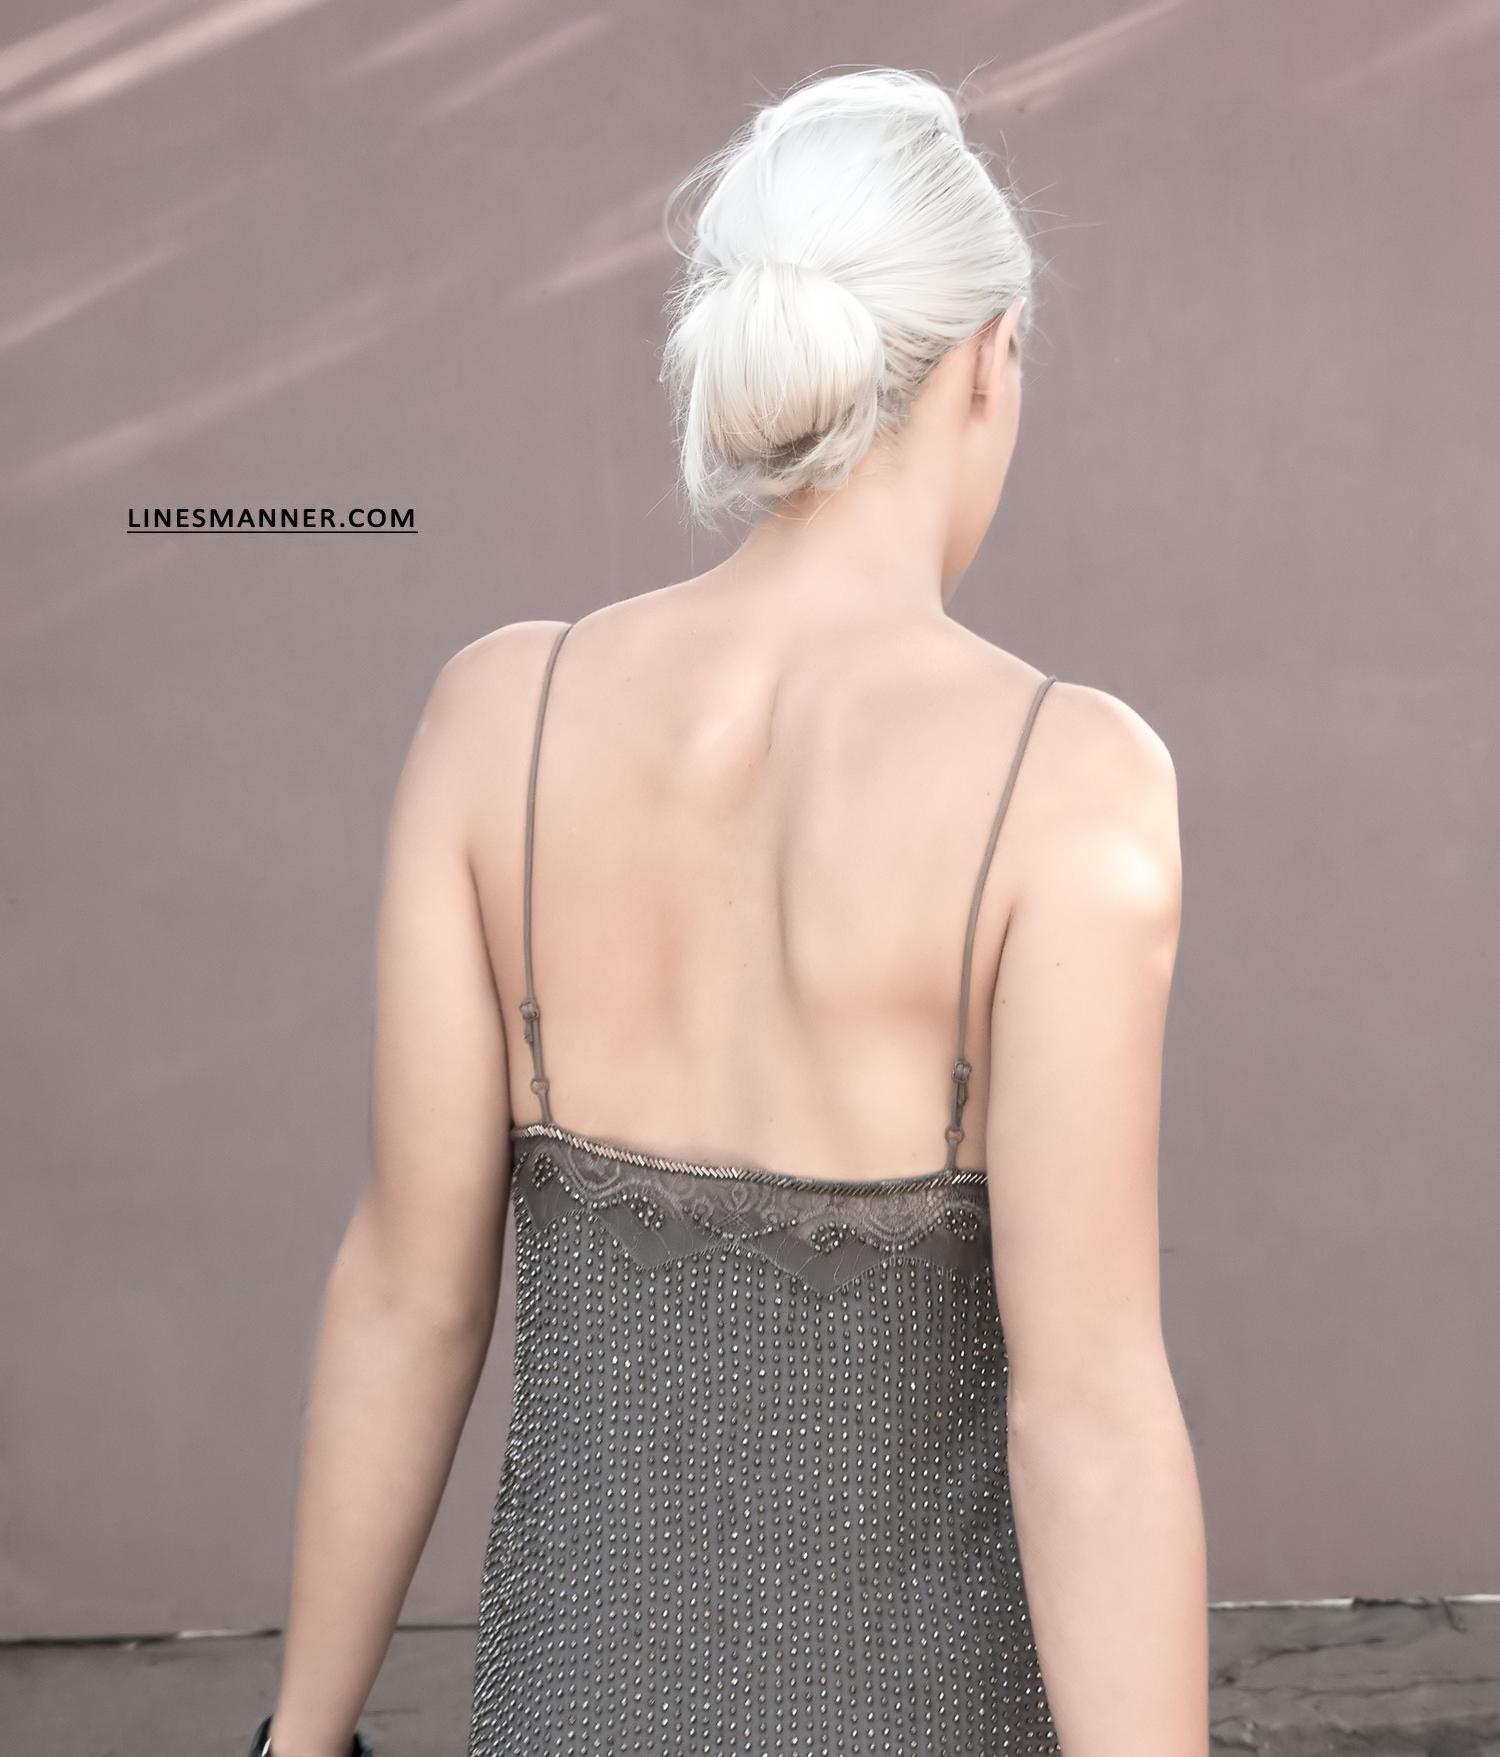 Lines-Manner-Magali_Pascal-Boheme-Chic-Minimalist-Bare_Minimal-Essential-Effortless-Details-Organic-Luxurious-Silk-Dress-Lace-10